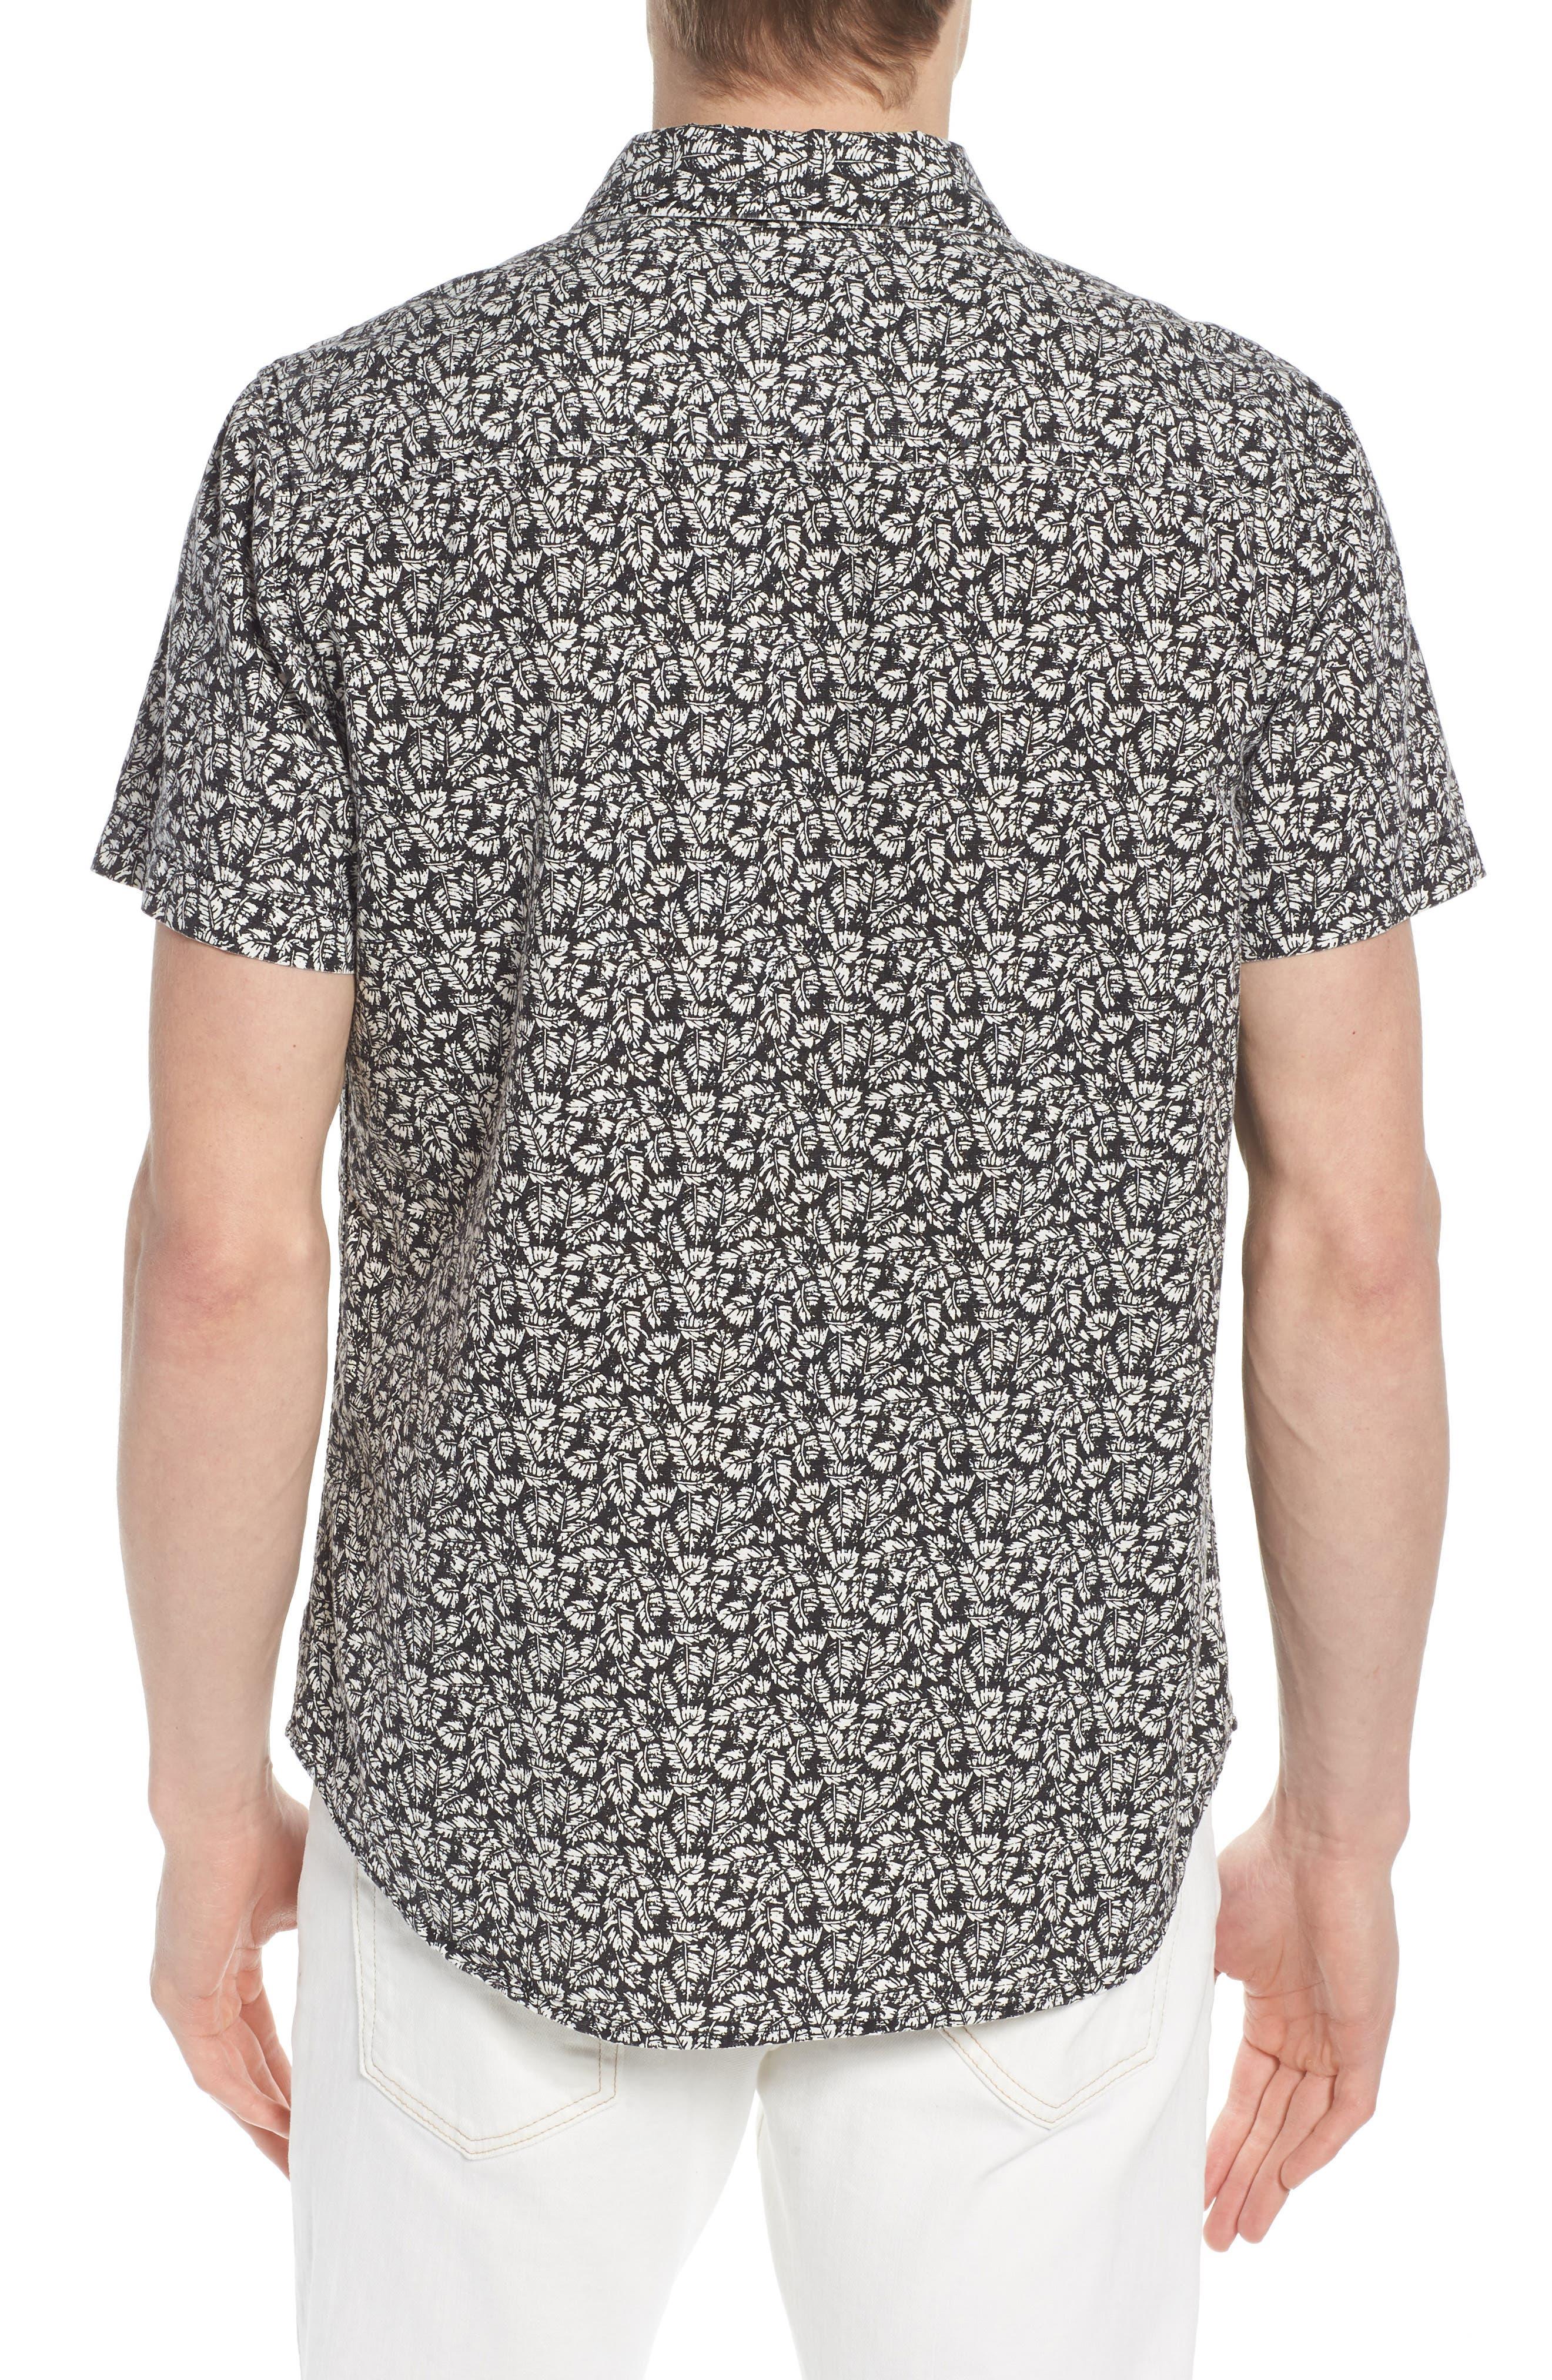 Nash Regular Fit Short Sleeve Sport Shirt,                             Alternate thumbnail 3, color,                             Palm Leaf True Black/ White